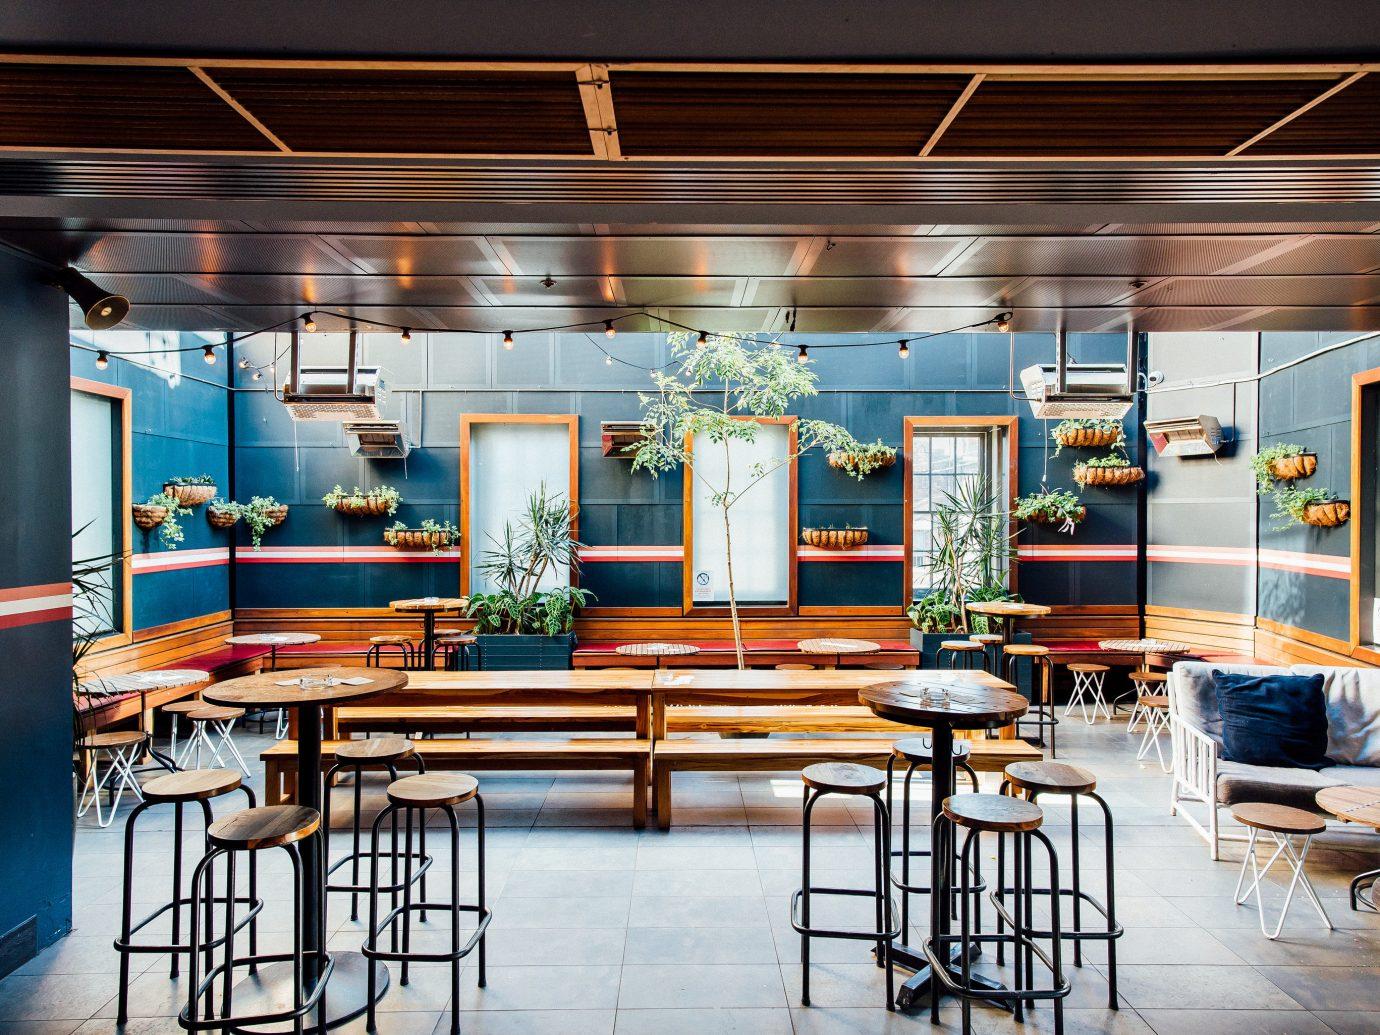 Budget indoor floor ceiling room dining room interior design restaurant estate function hall Design furniture